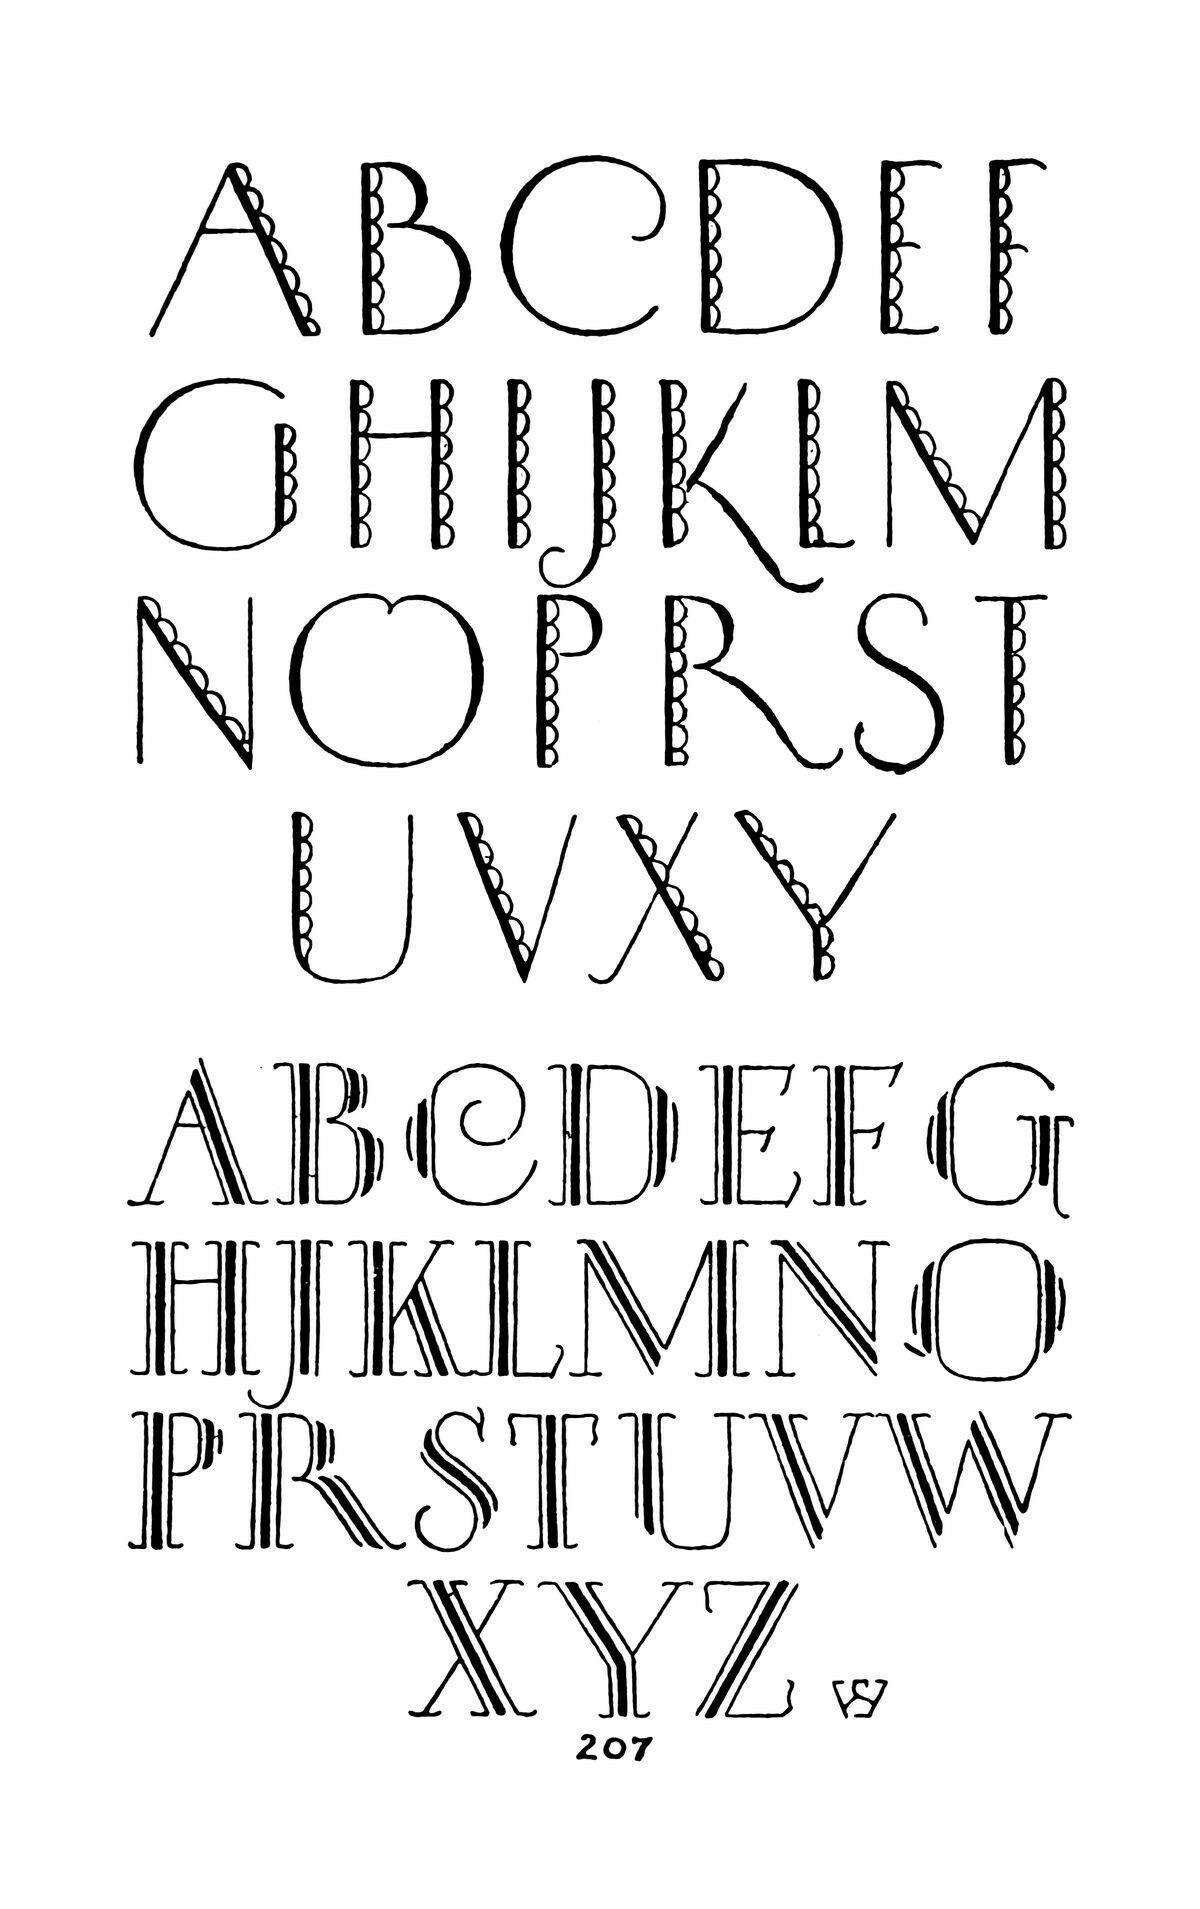 Pin On Alphabet Designs